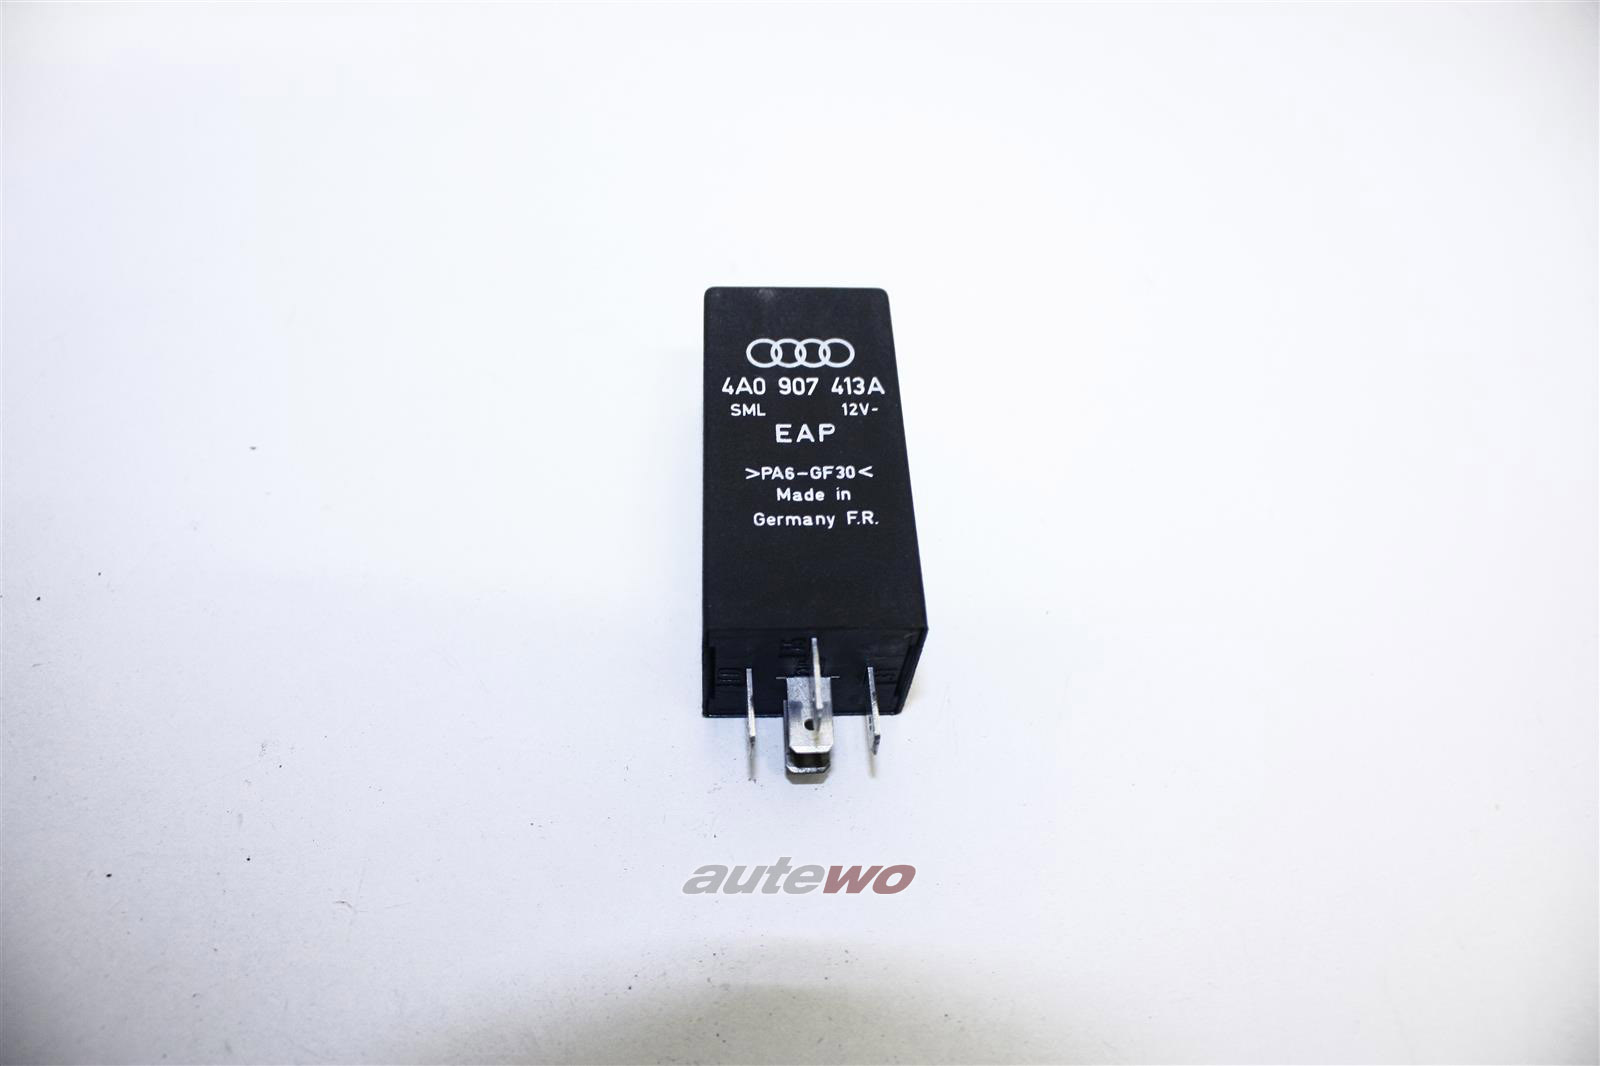 Audi 100 C4 2.5l 115PS AAT Steuergerät Motorlager/Hydrolager Relais 355 4A0907413A